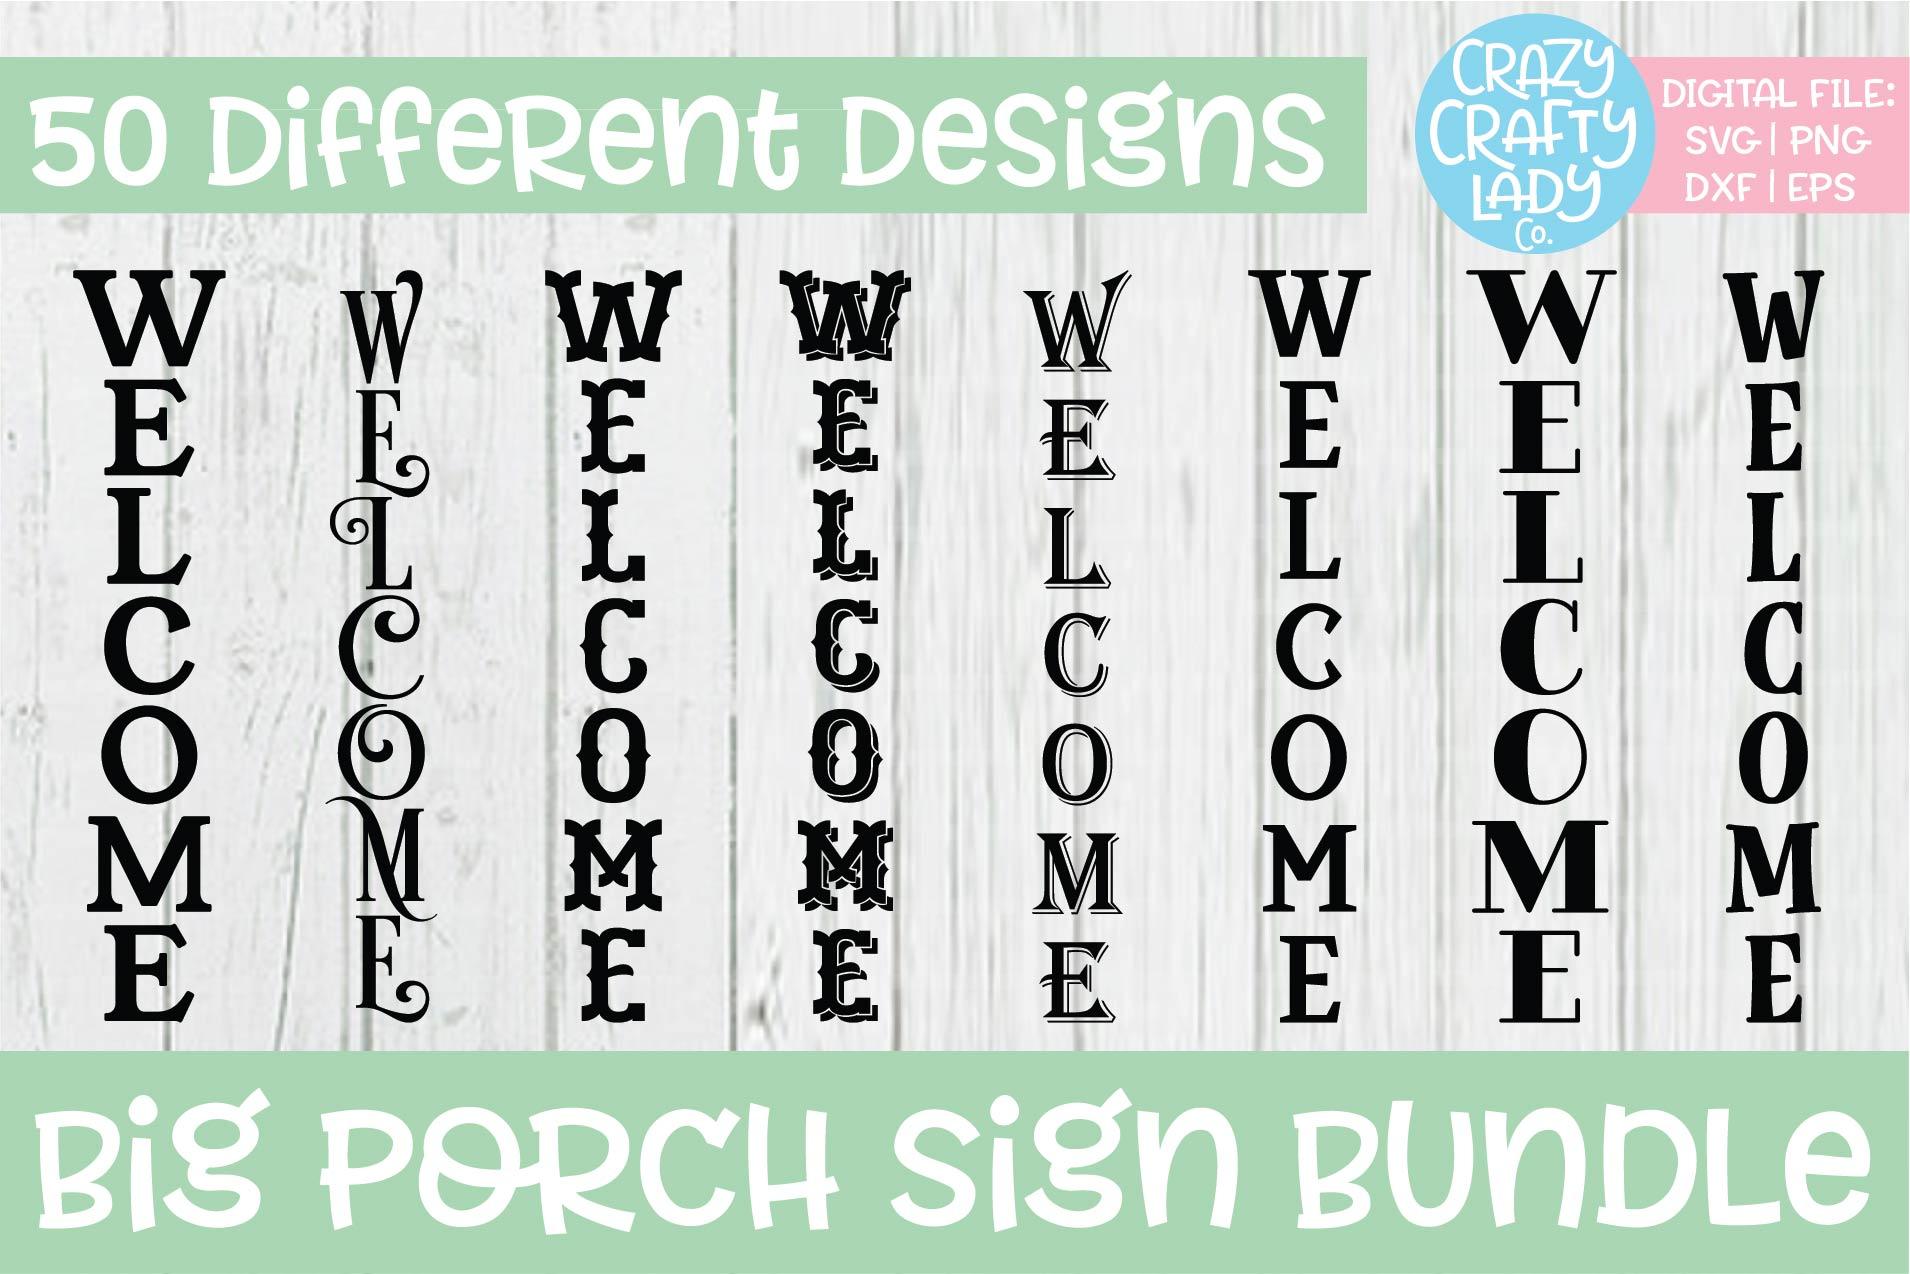 Big Porch Sign SVG DXF EPS PNG Cut File Bundle example image 5